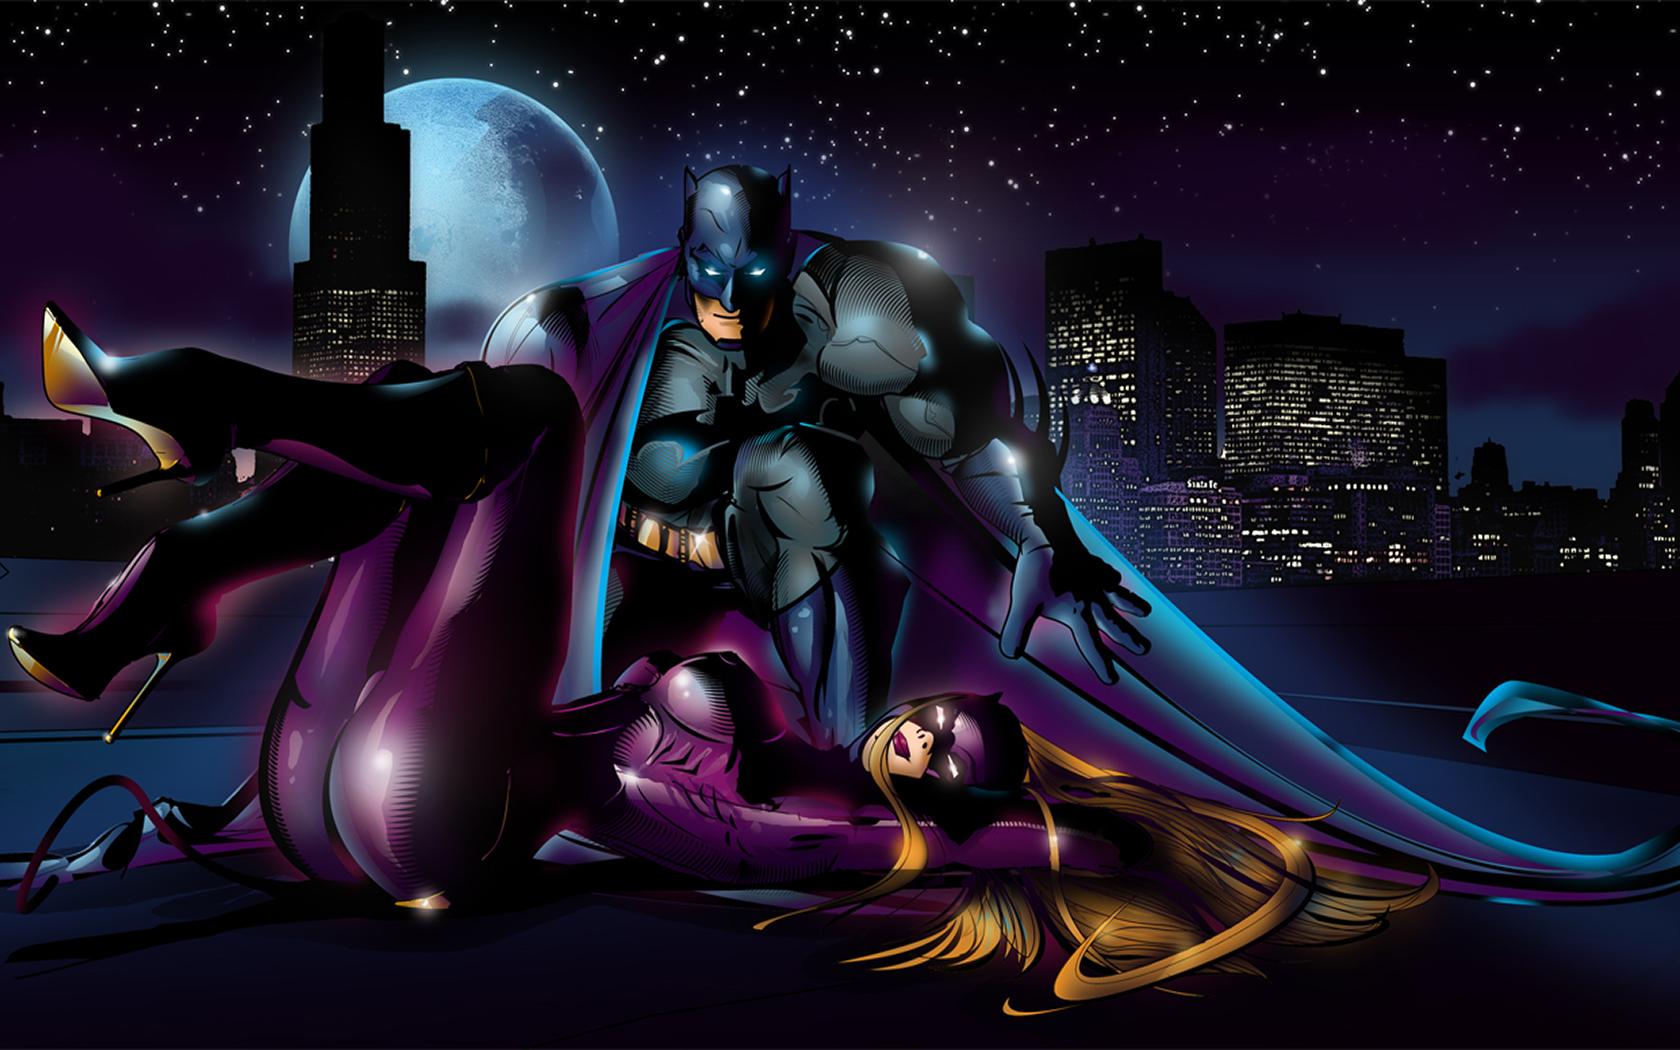 Cartoons Wallpapers   Batman Catwoman In Gotham 1680x1050 wallpaper 1680x1050